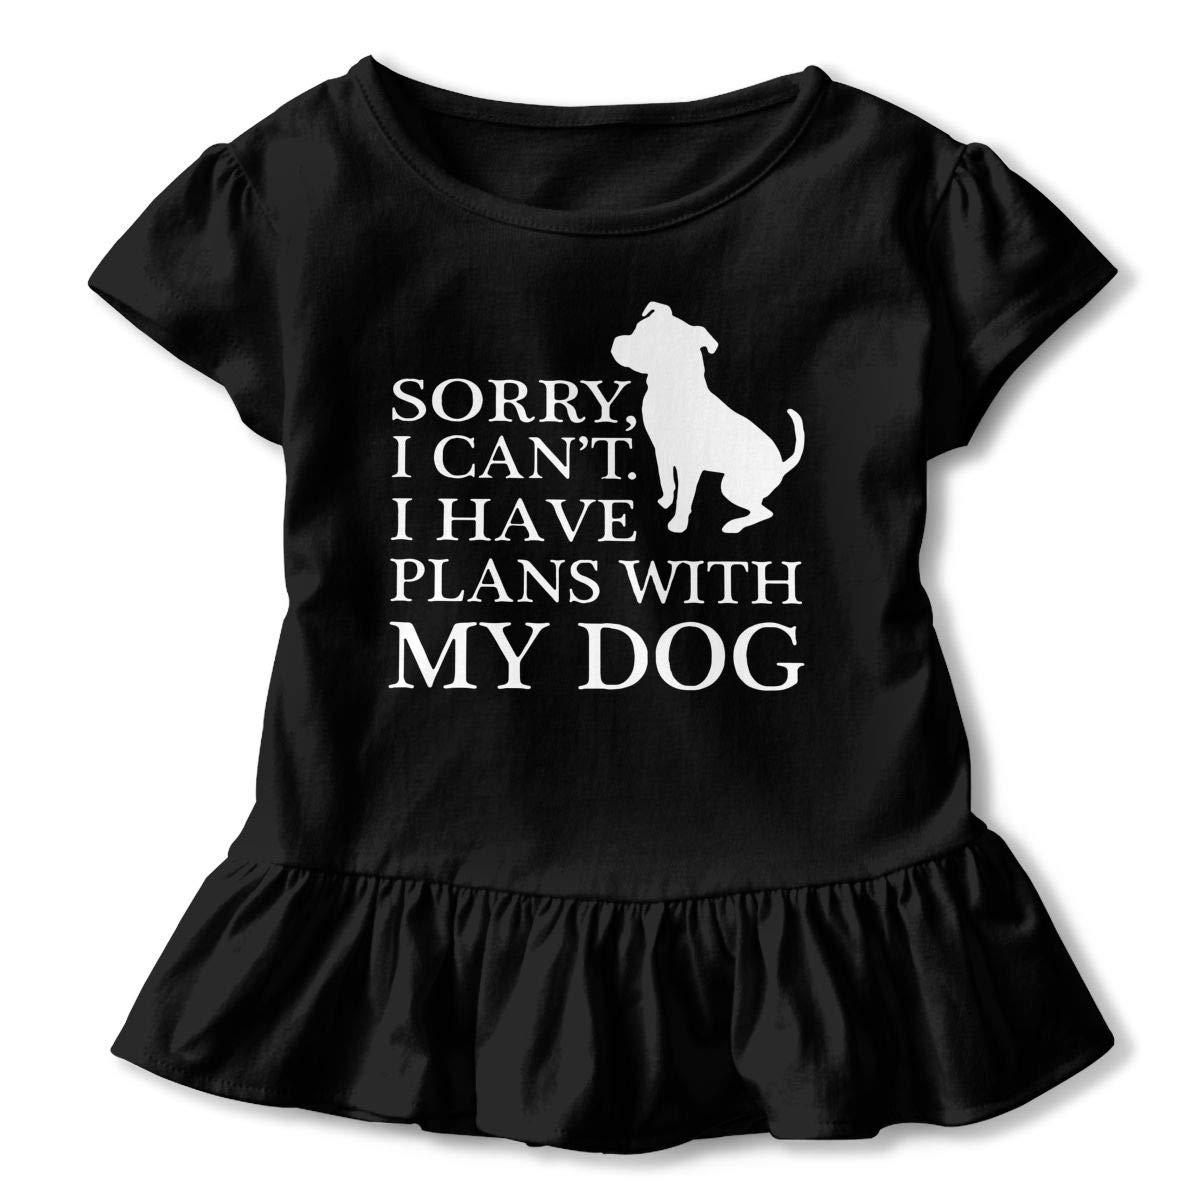 SHIRT1-KIDS My Dog Pitbull Mom Childrens Girls Short Sleeve Ruffles Shirt T-Shirt for 2-6 Toddlers